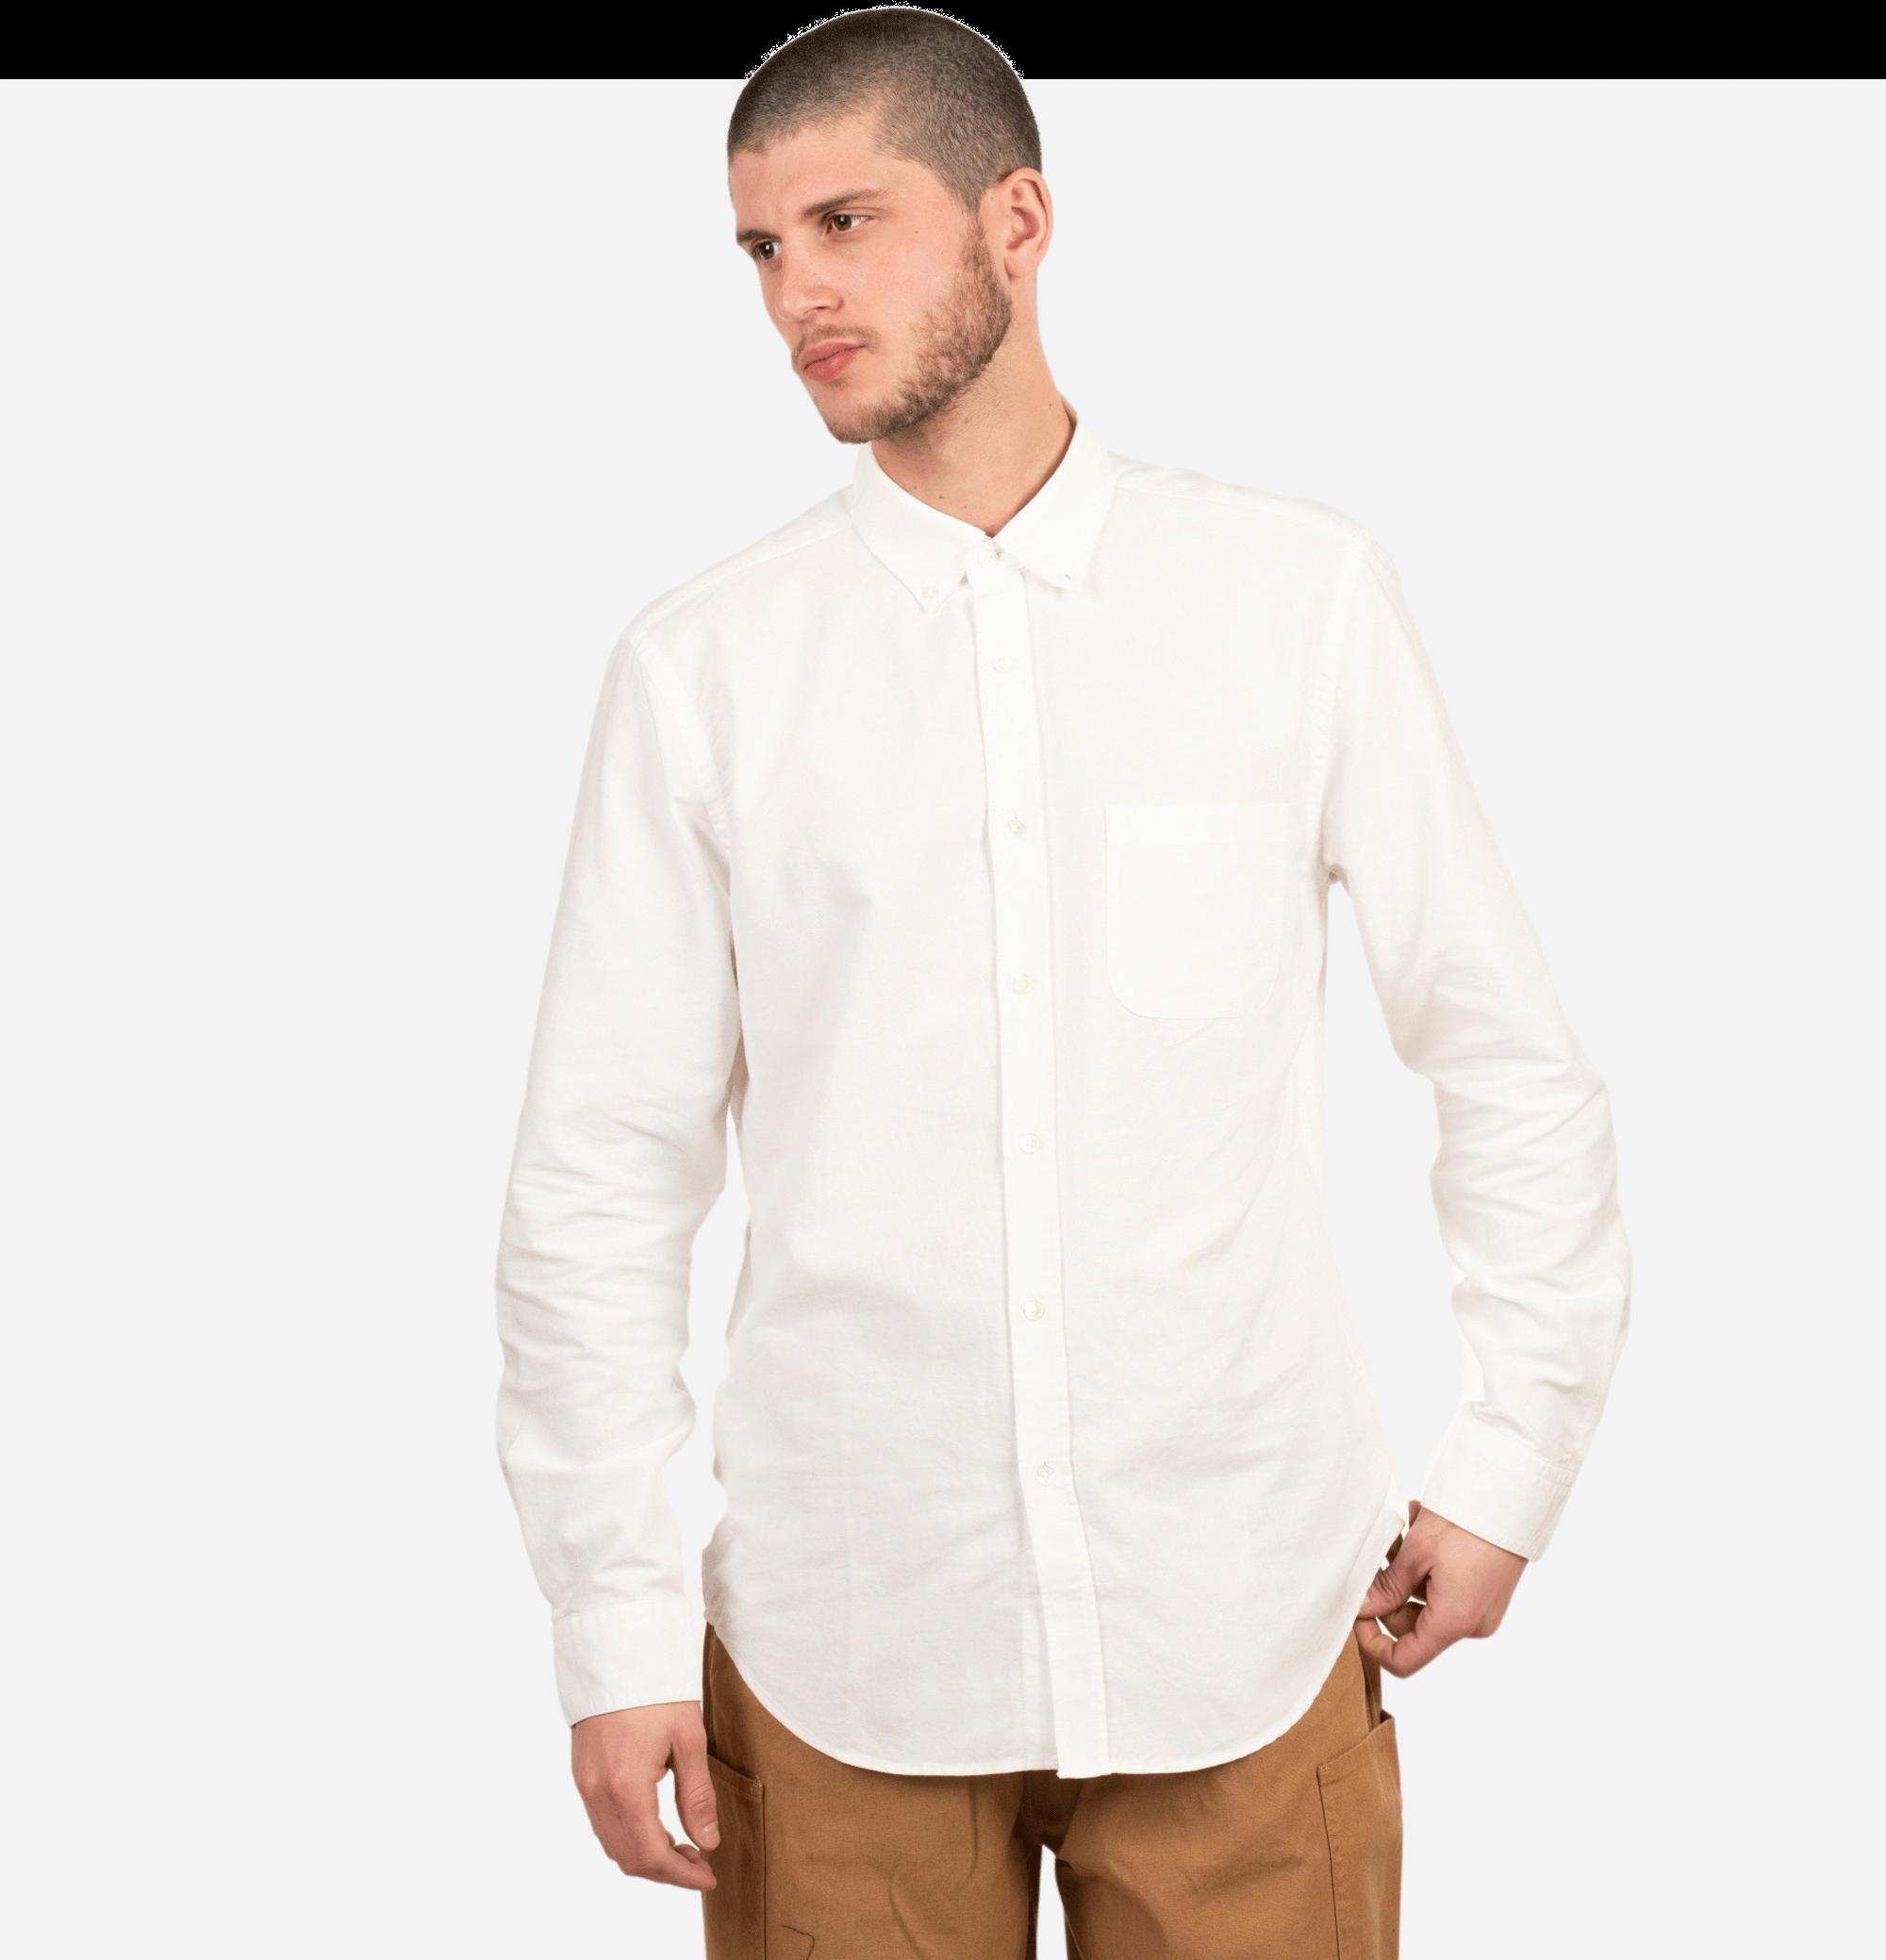 Belavista Shirt White